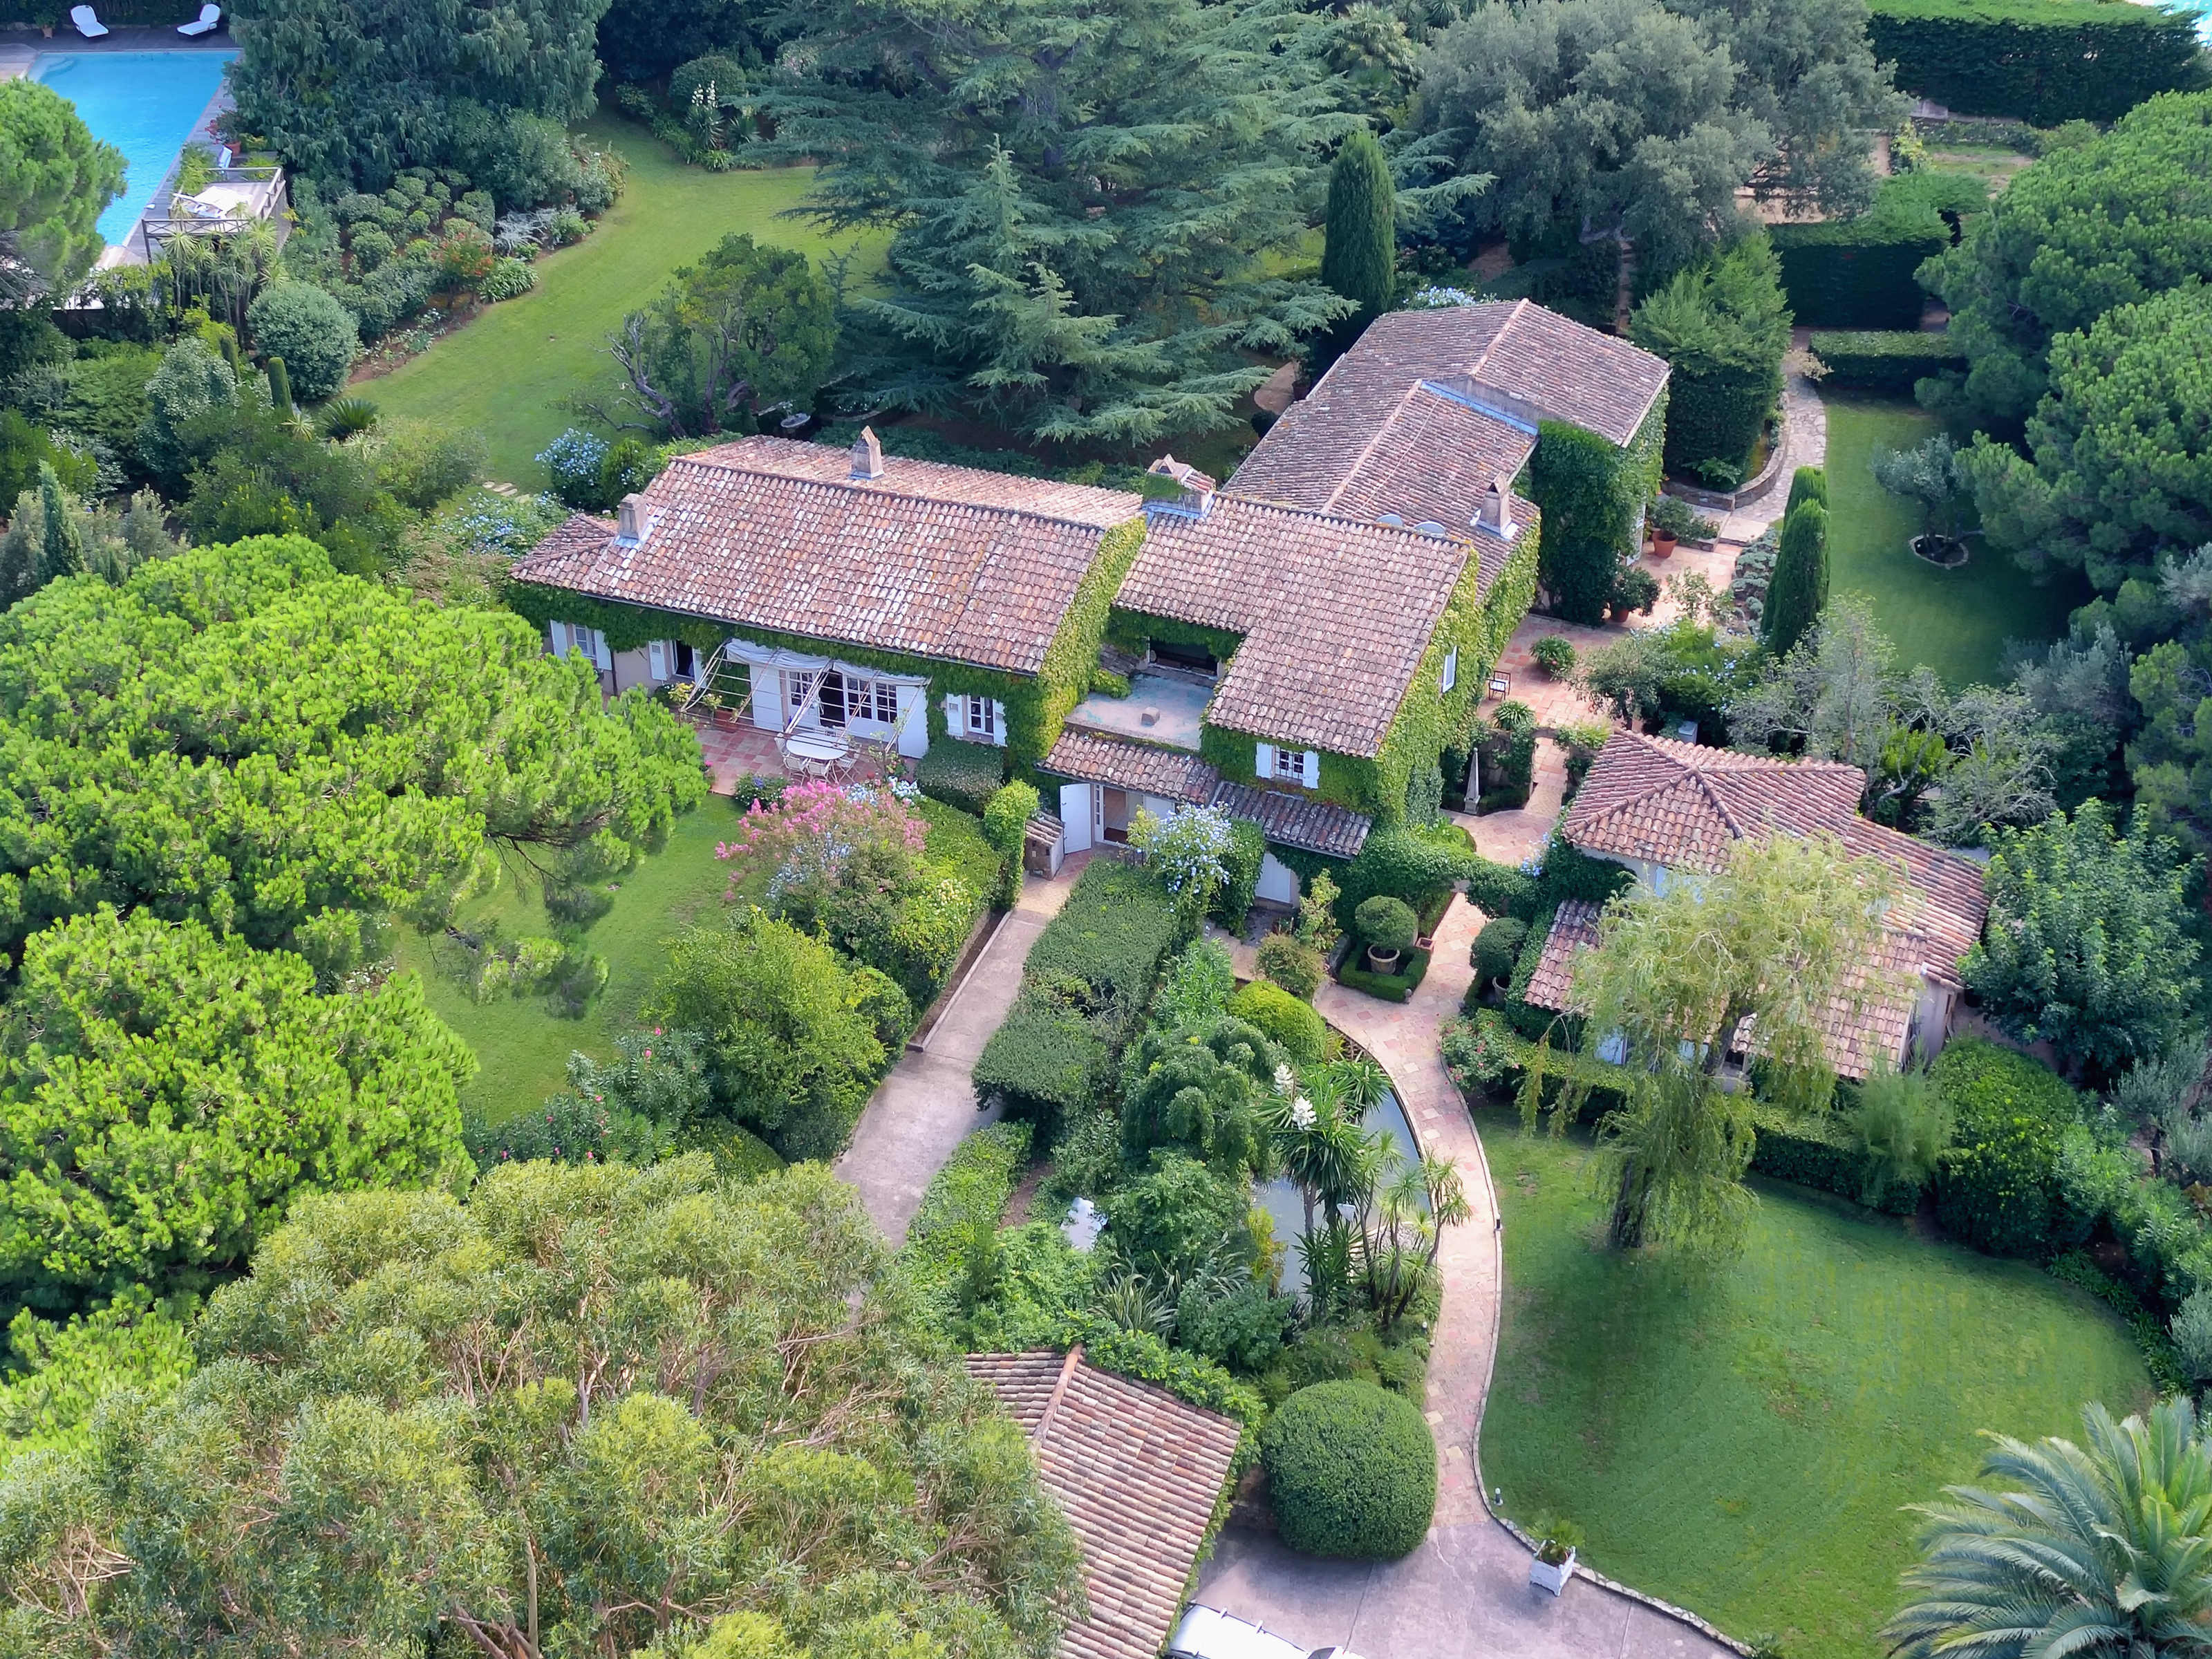 Villa per Vendita alle ore Exceptional provençal villa in walking distance tothe town centre and beaches Saint Tropez, Provenza-Alpi-Costa Azzurra 83990 Francia